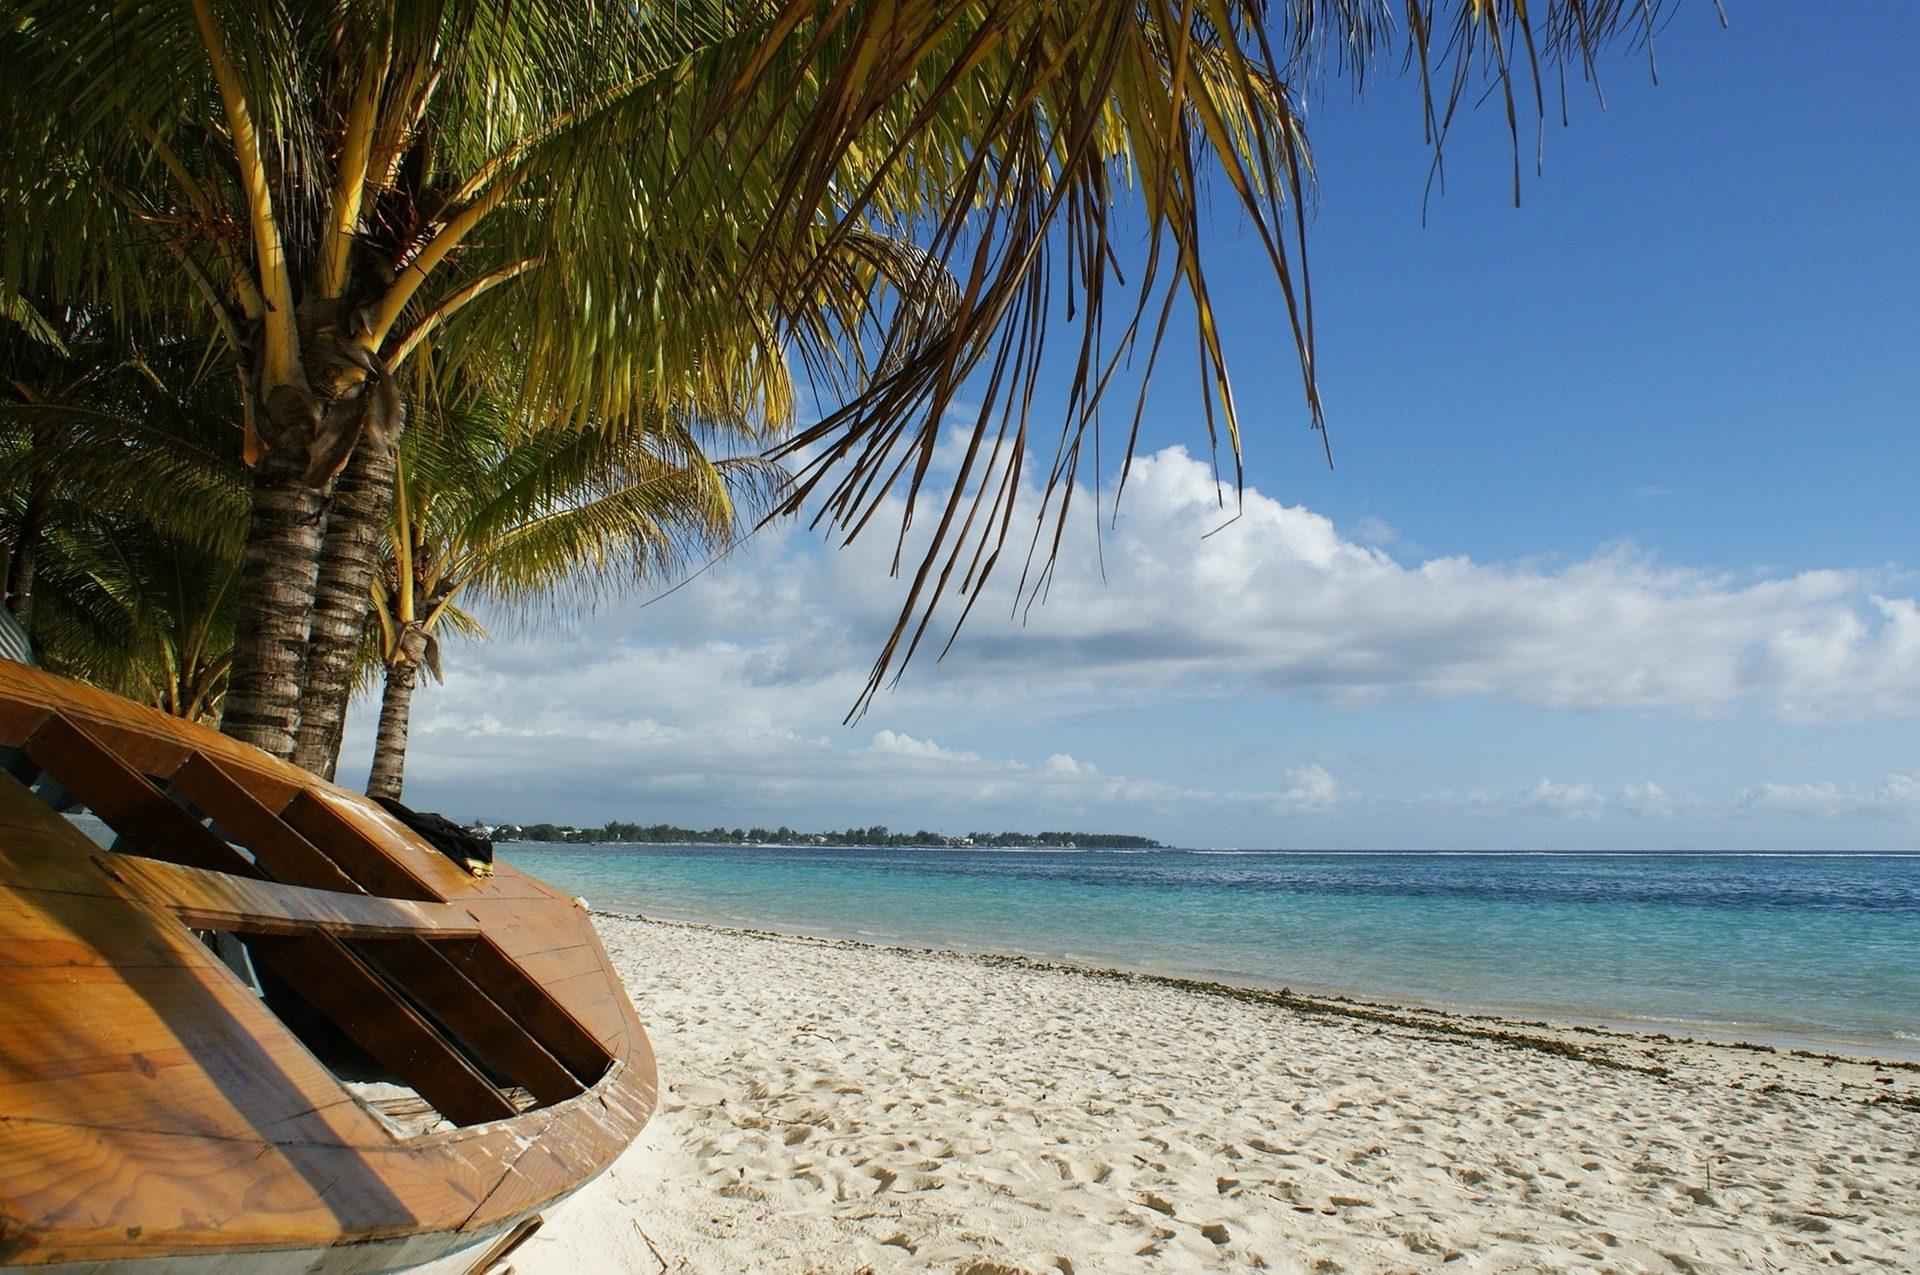 Mauritius All Inclusive Urlaub günstig ab 1169,00€ - 9 Tage 1